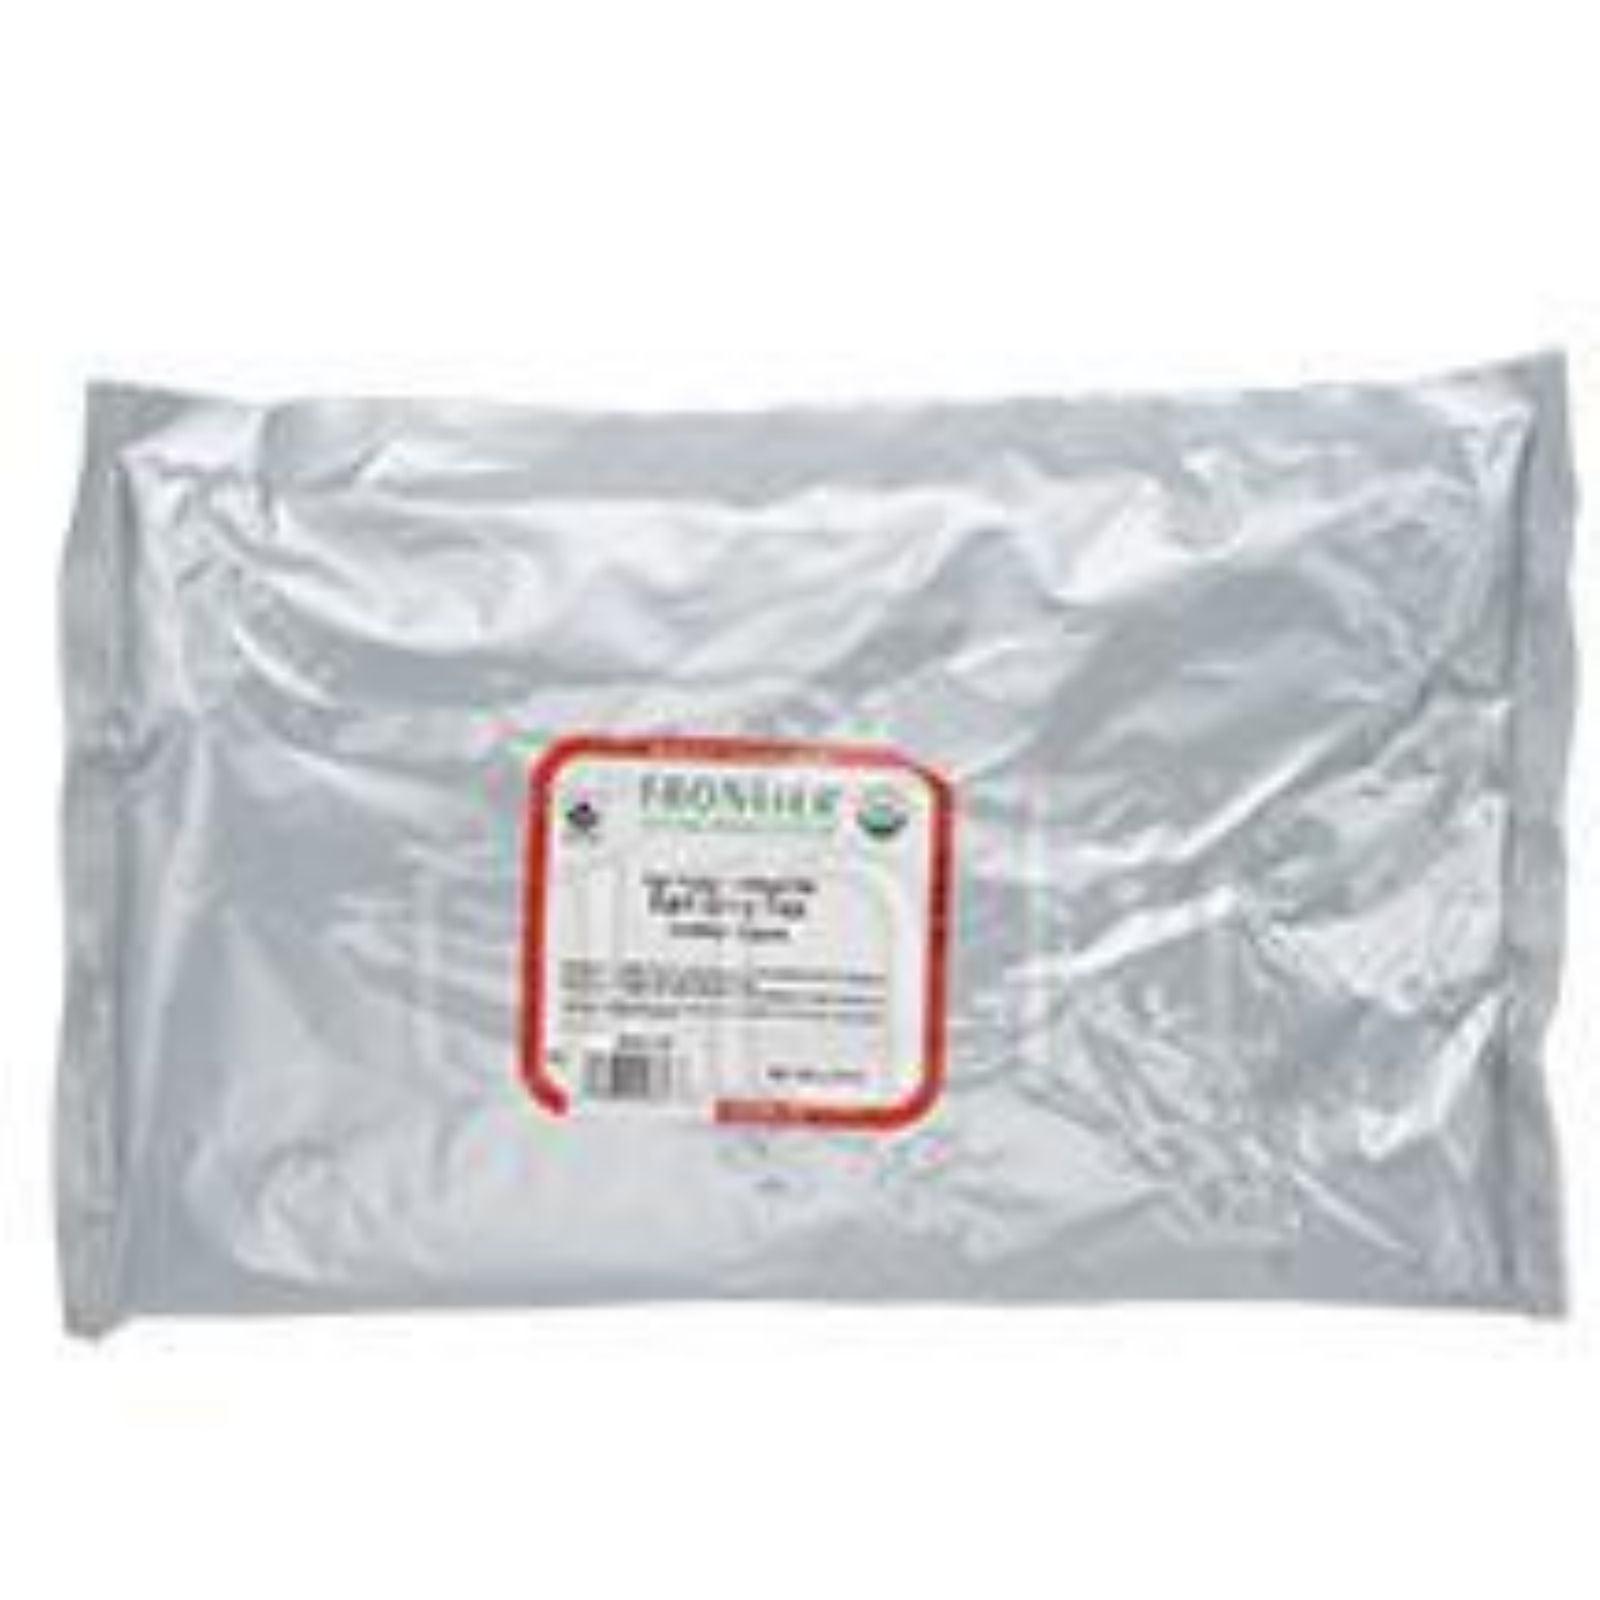 Frontier Herb Tea - Organic - Fair Trade Certified - Blac...